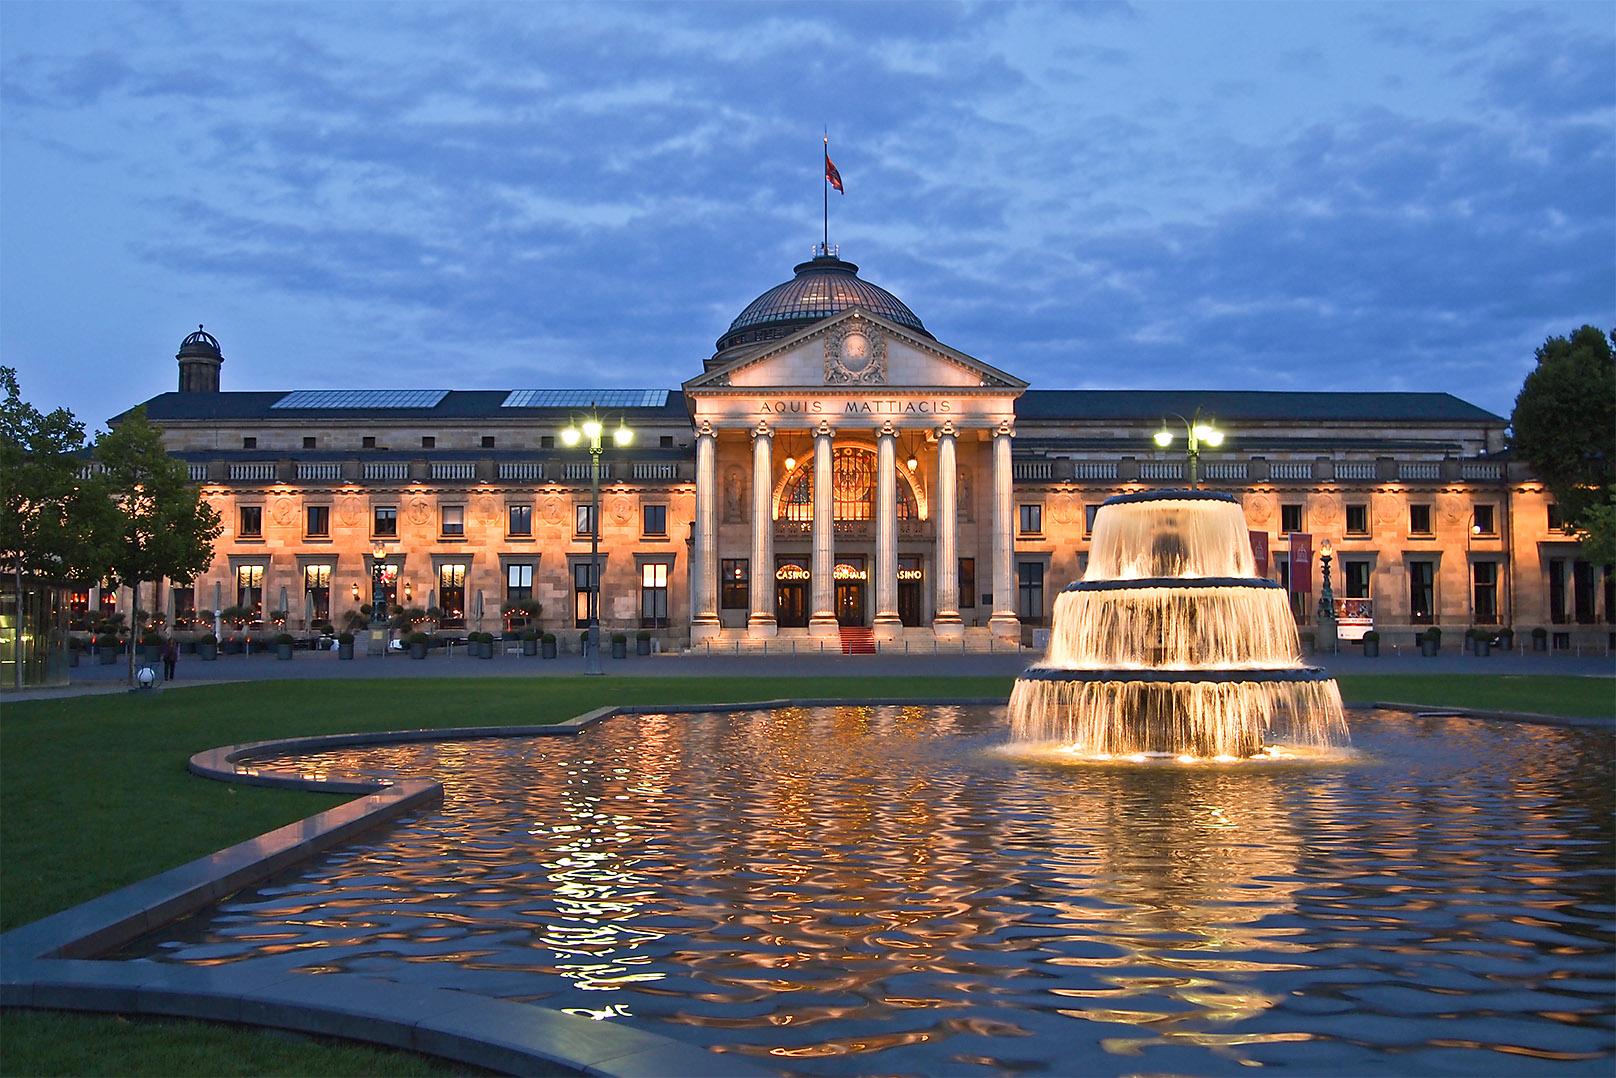 Wiesbaden Germany Palace